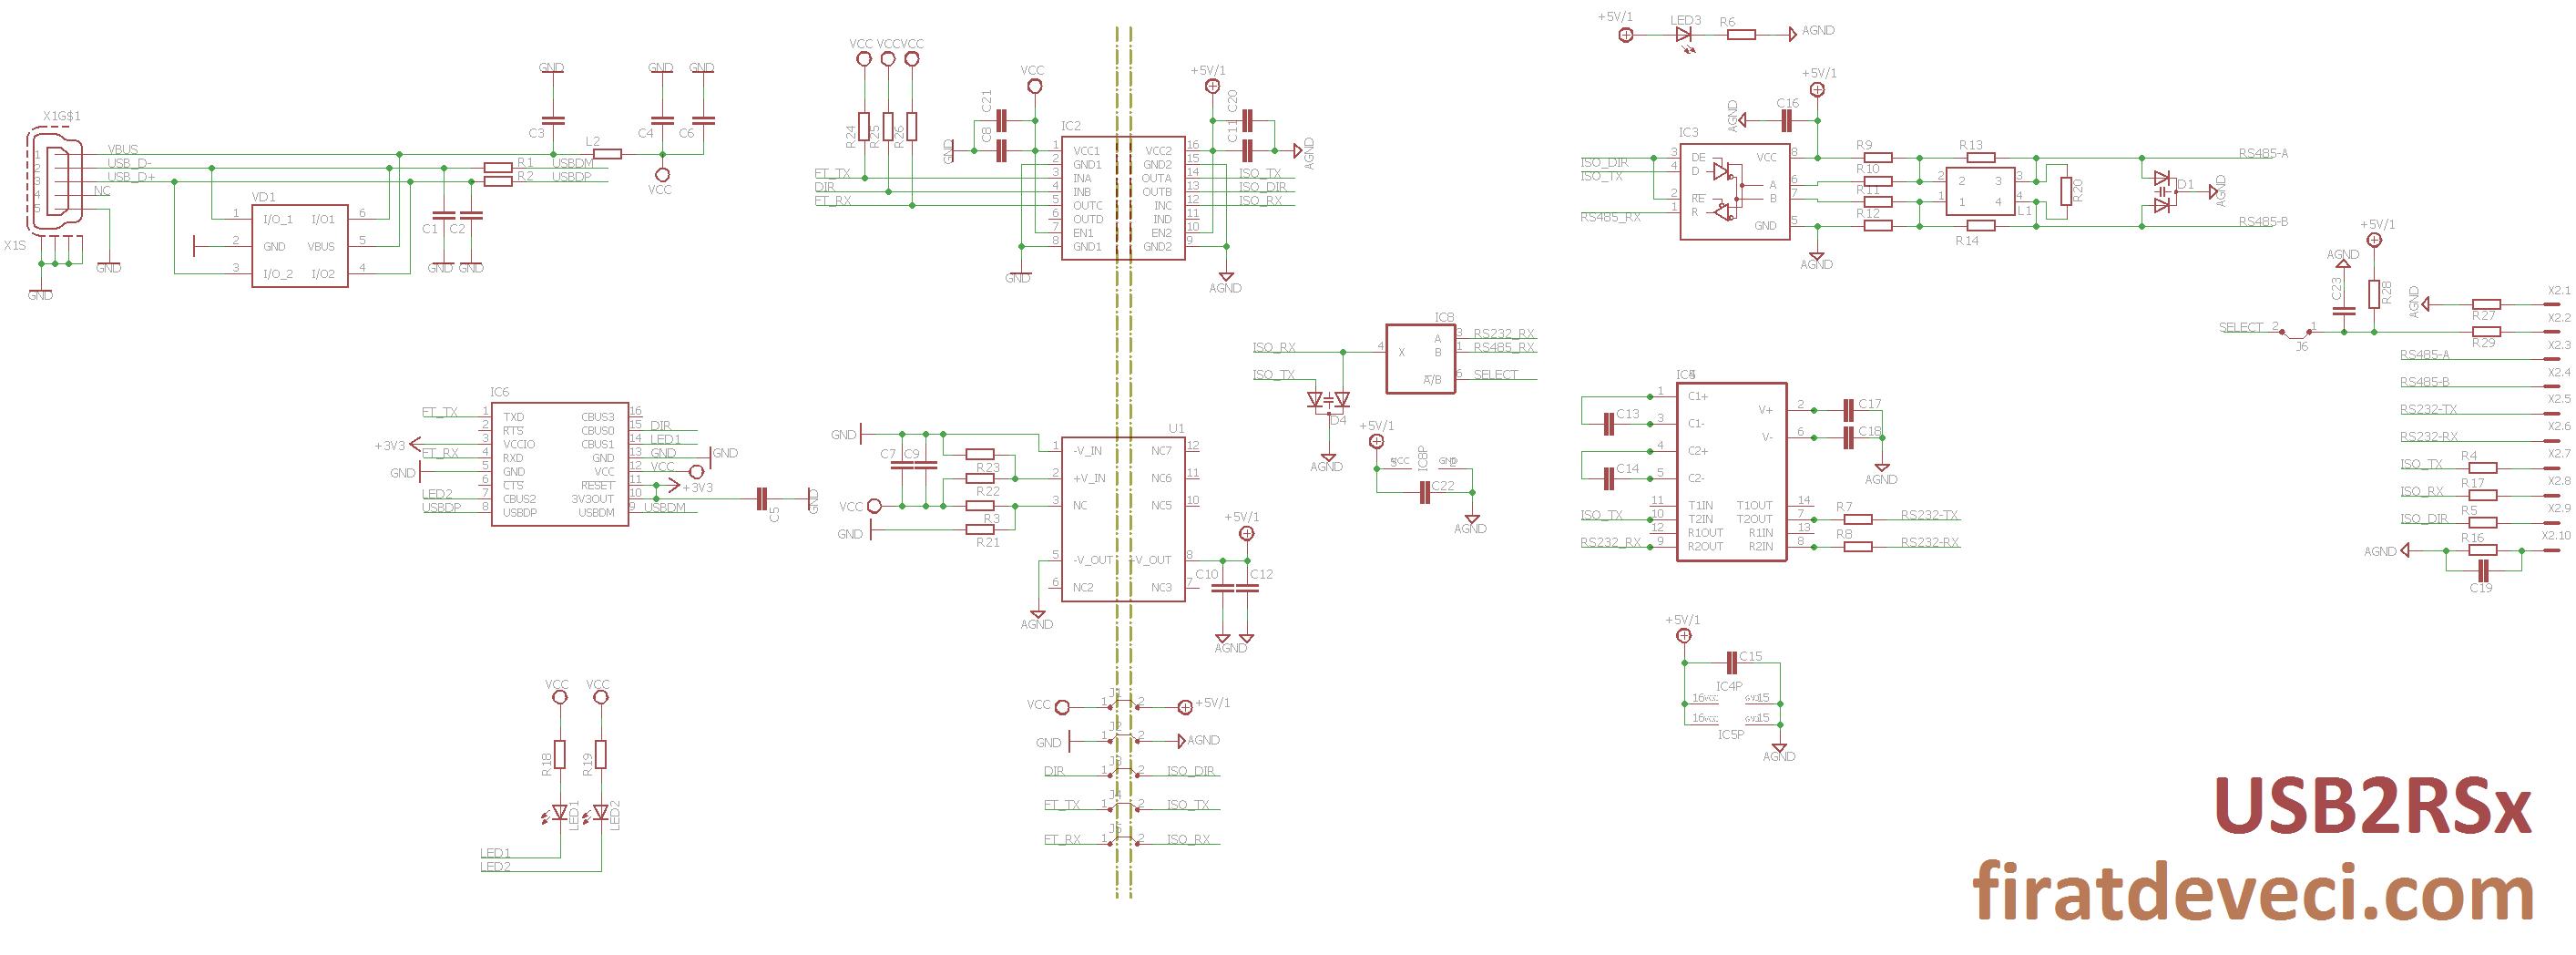 USB2RSx_Circuit